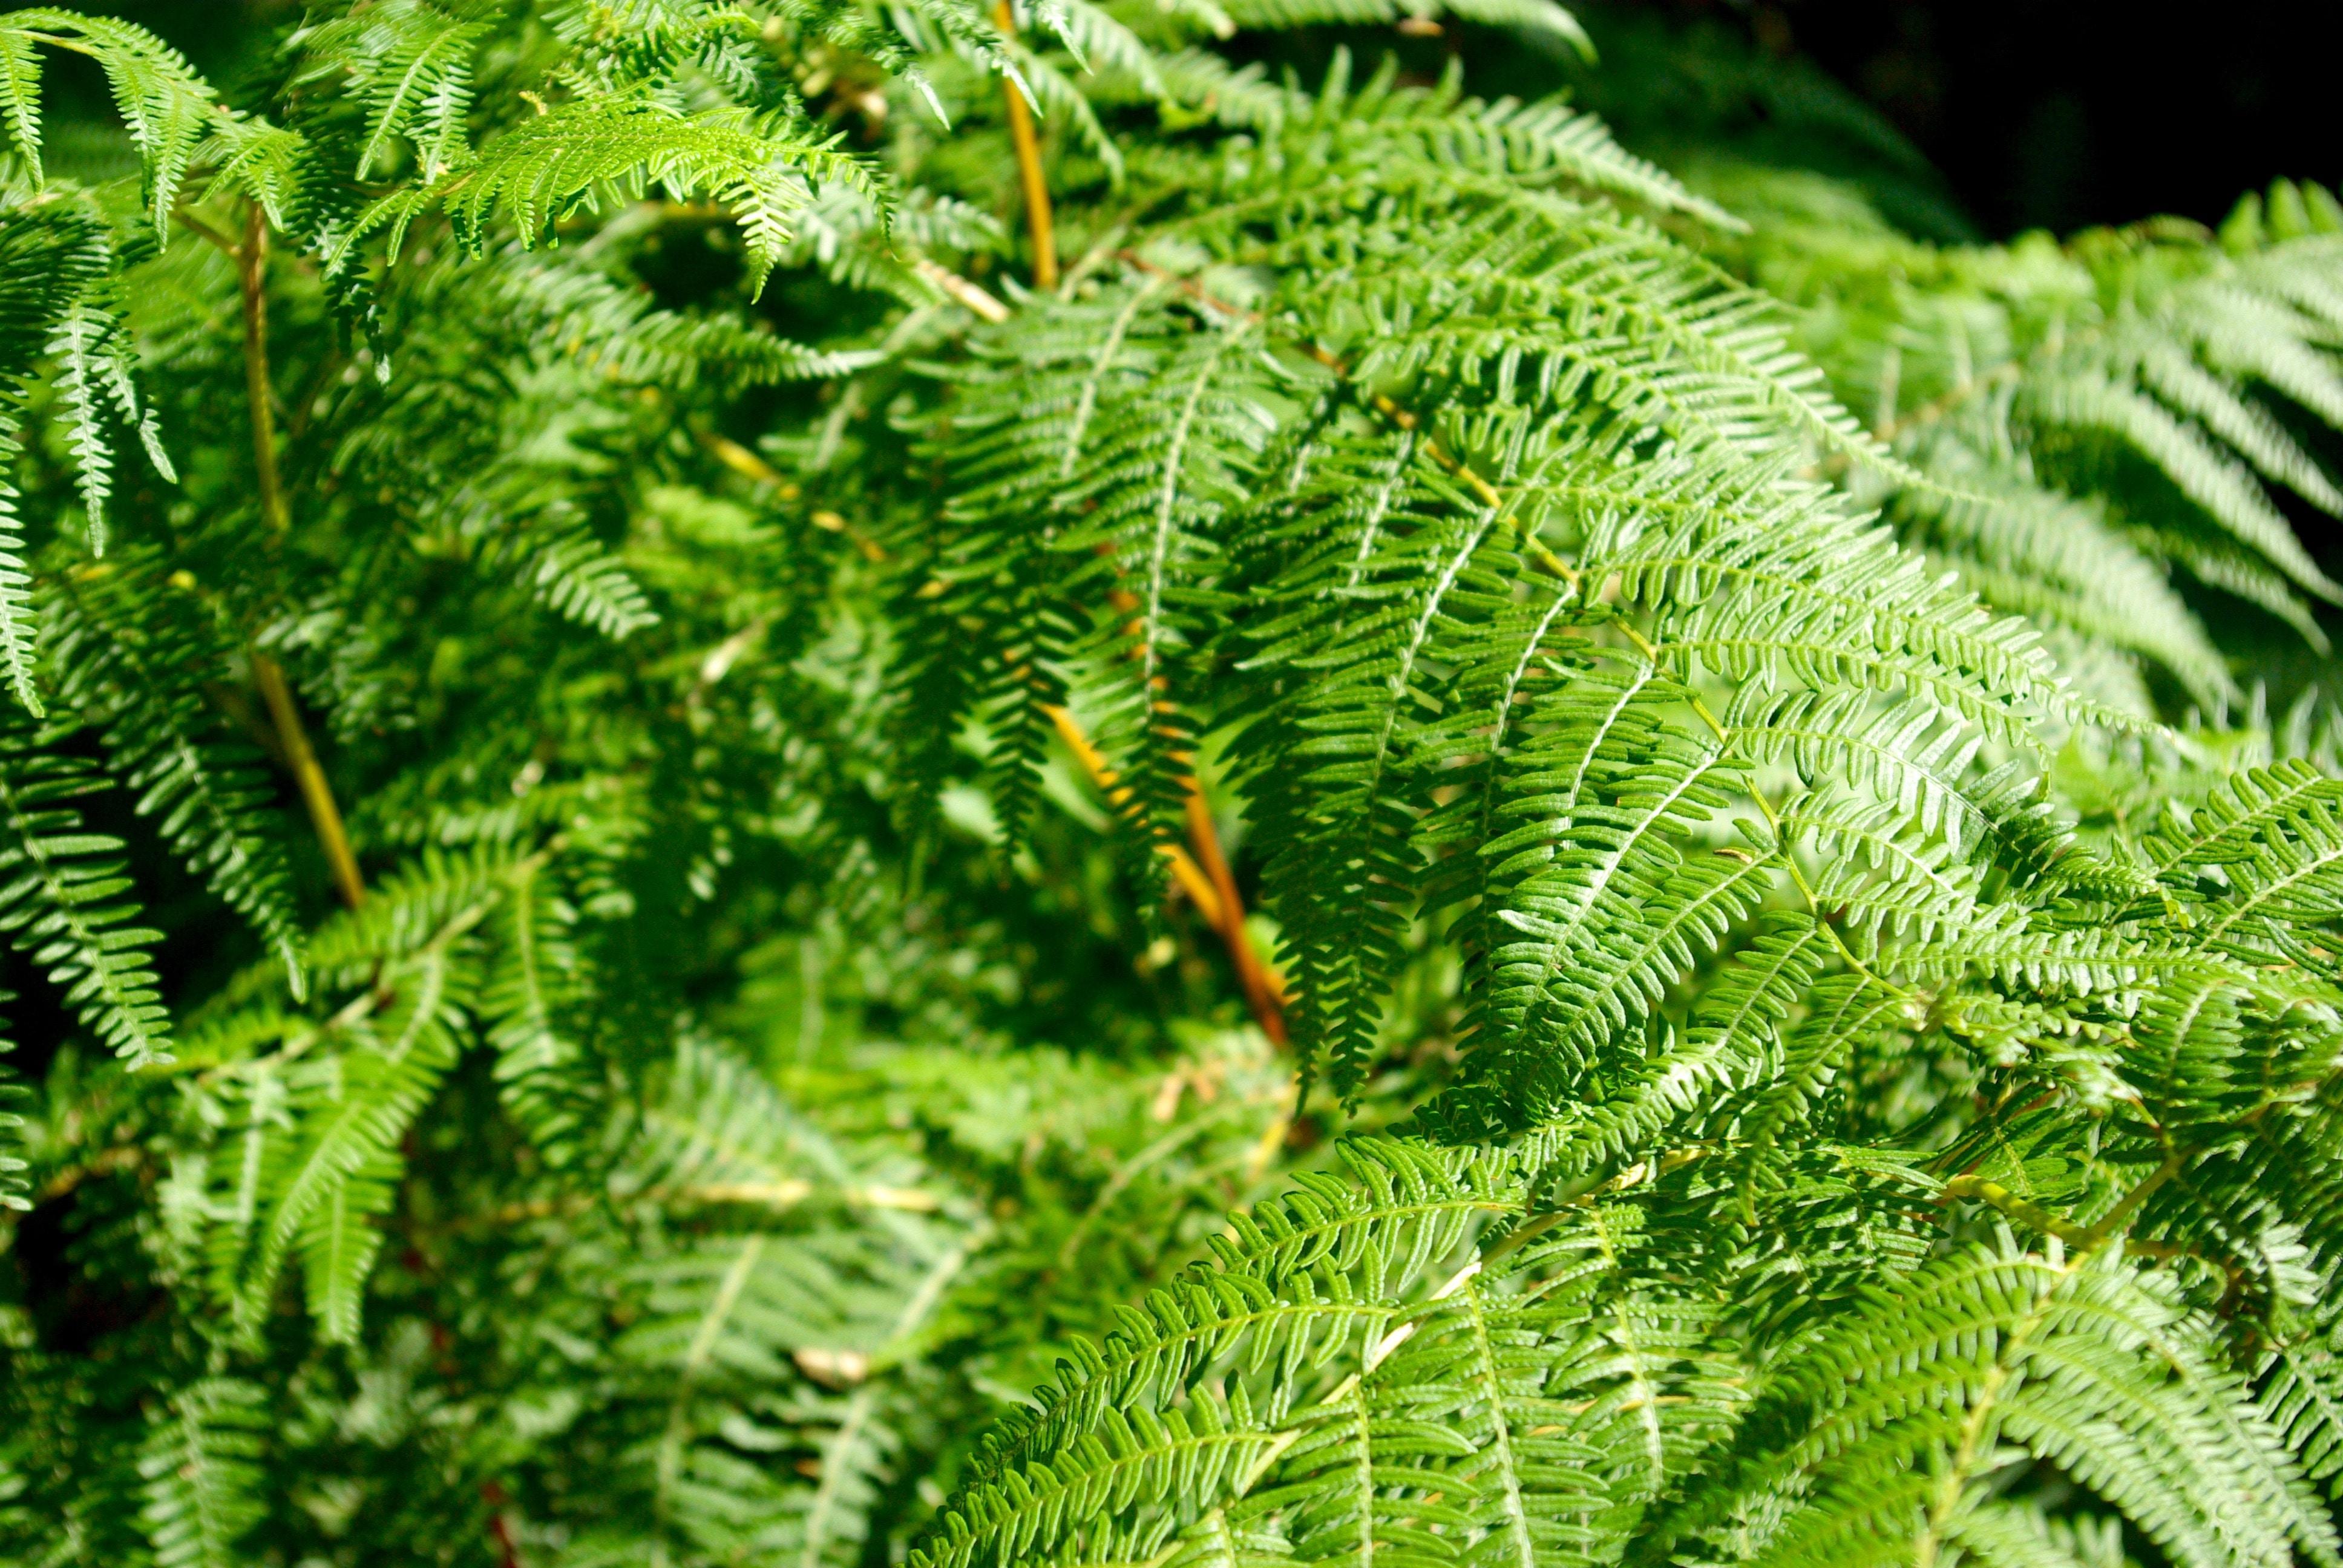 fern plant photo